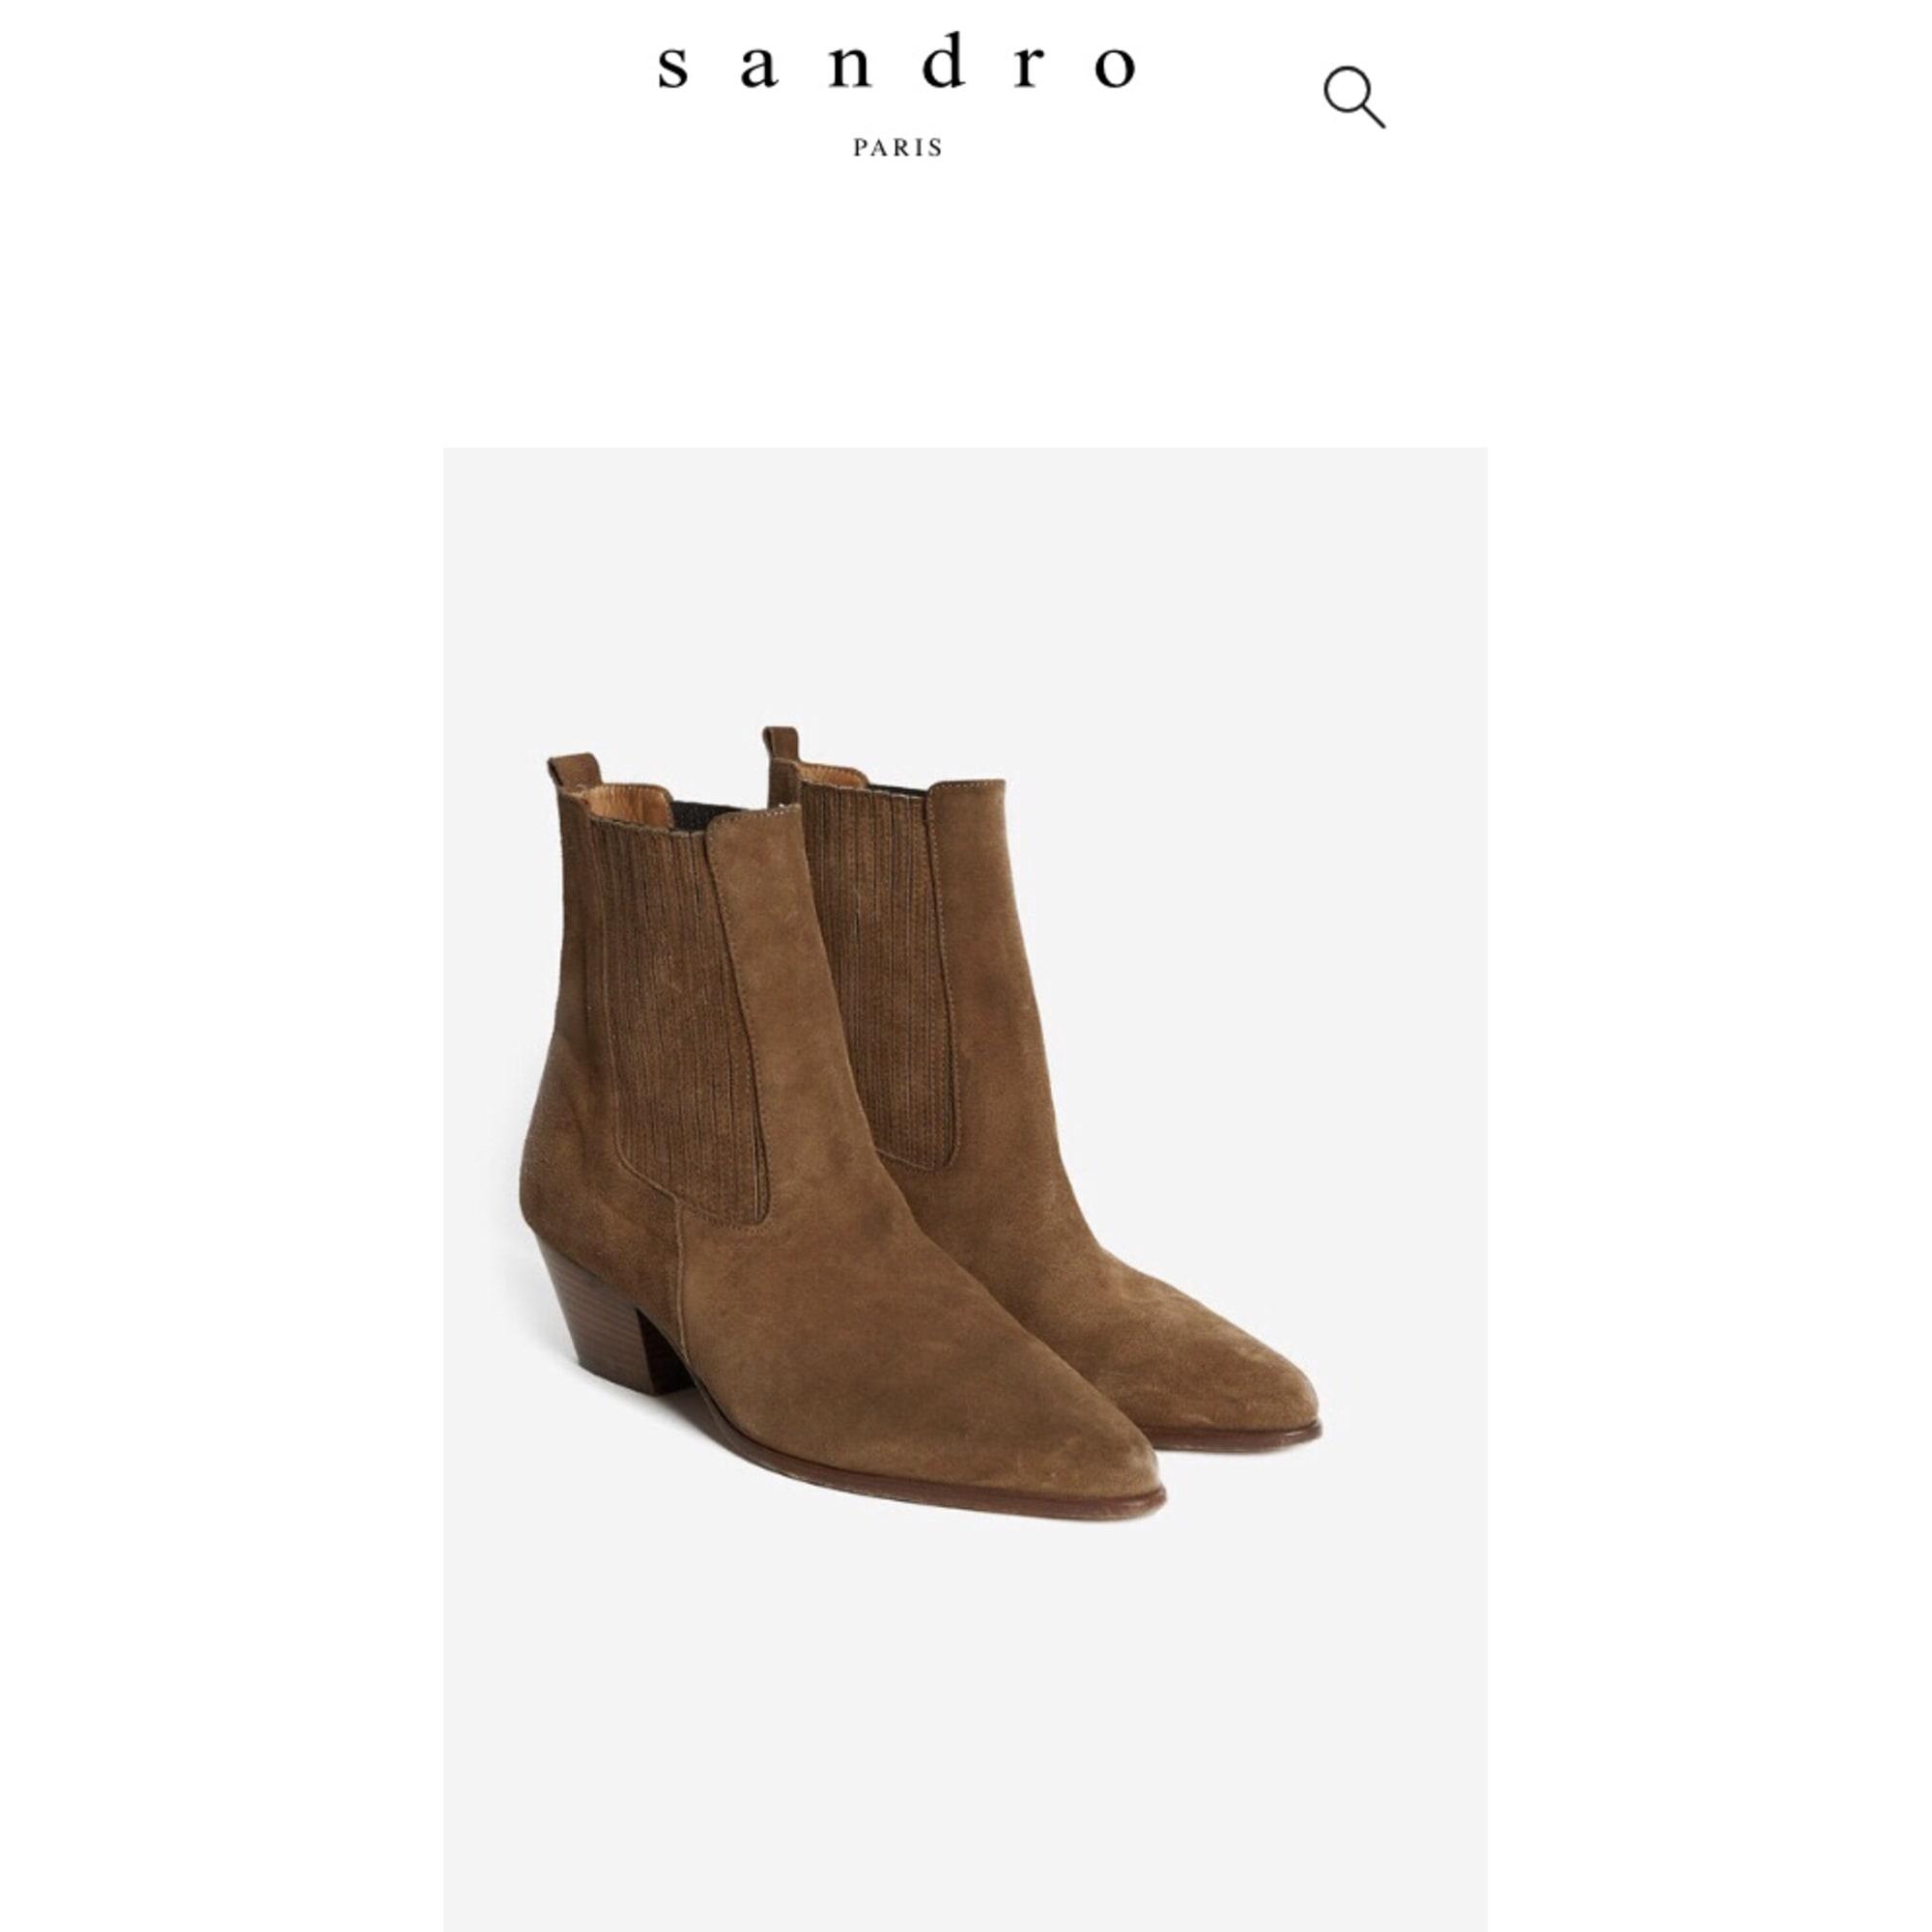 sandro bottines camel